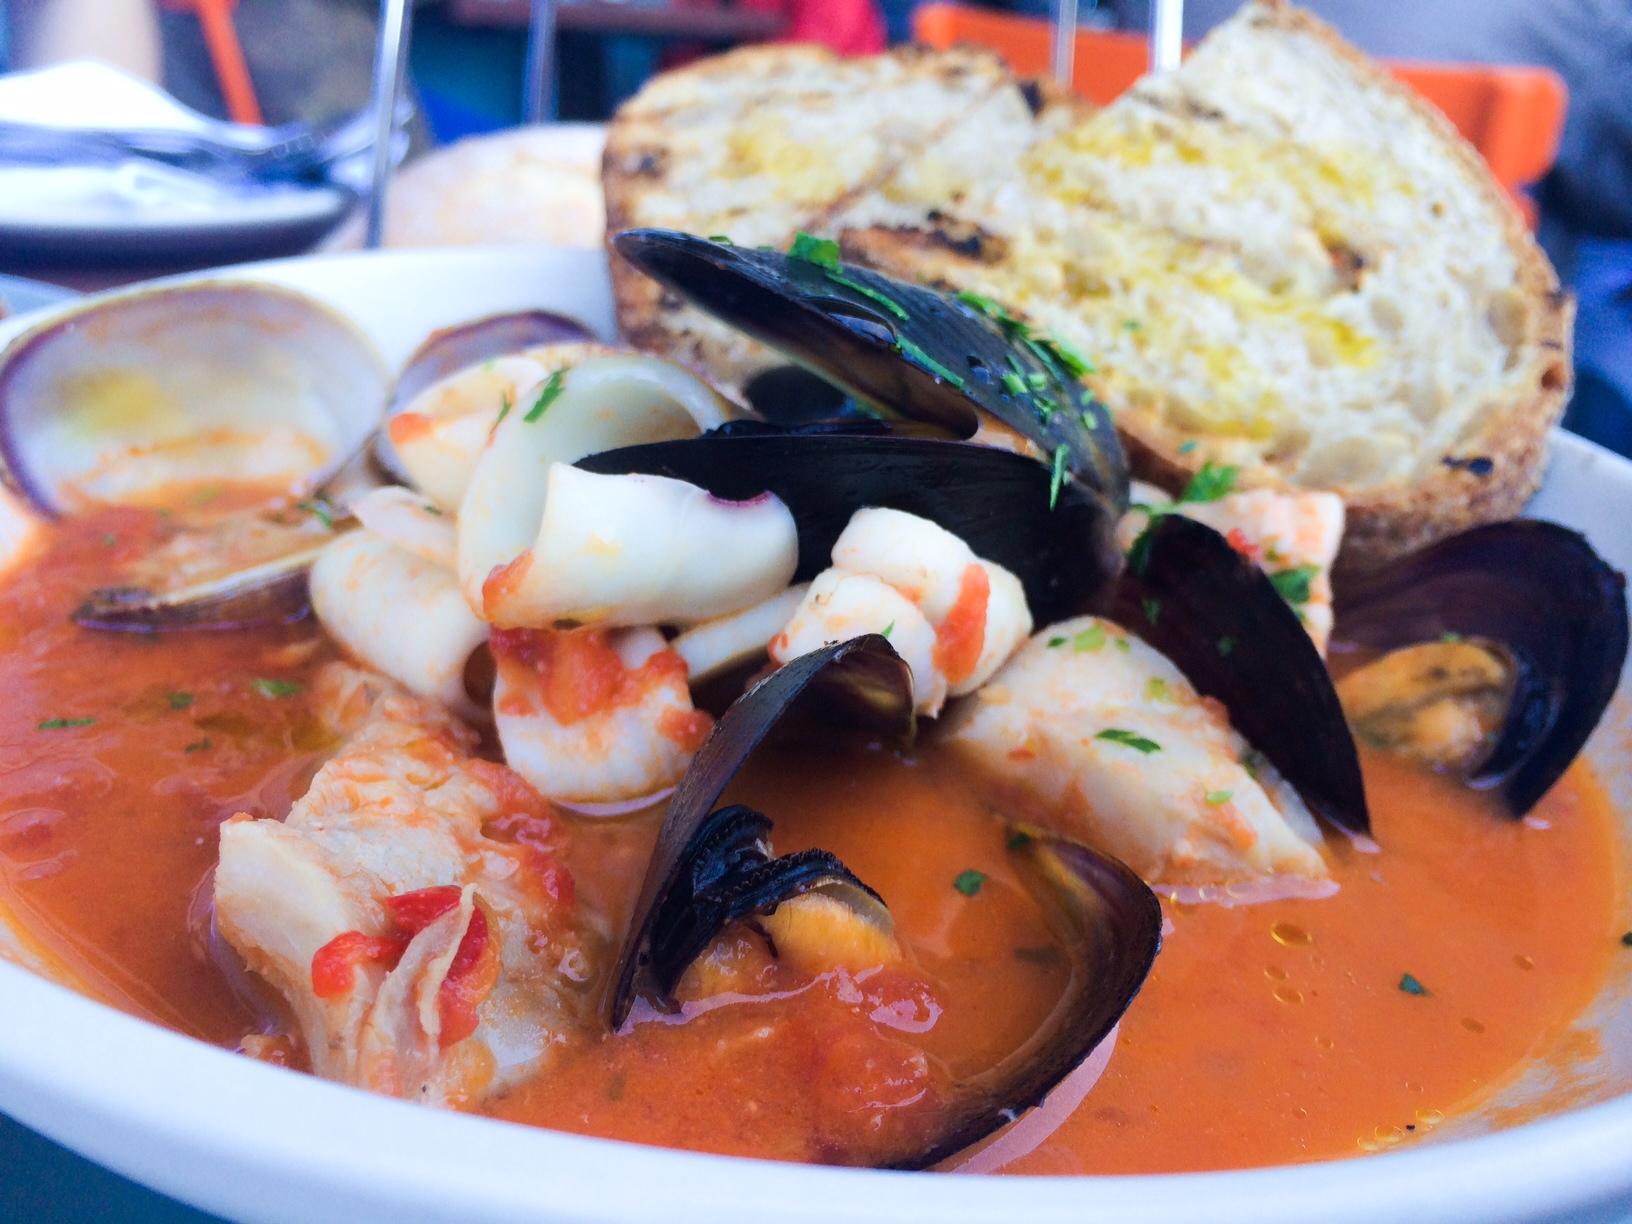 Hog Island Oyster Co- The best clam chowder & grilled cheese | Cyn ...